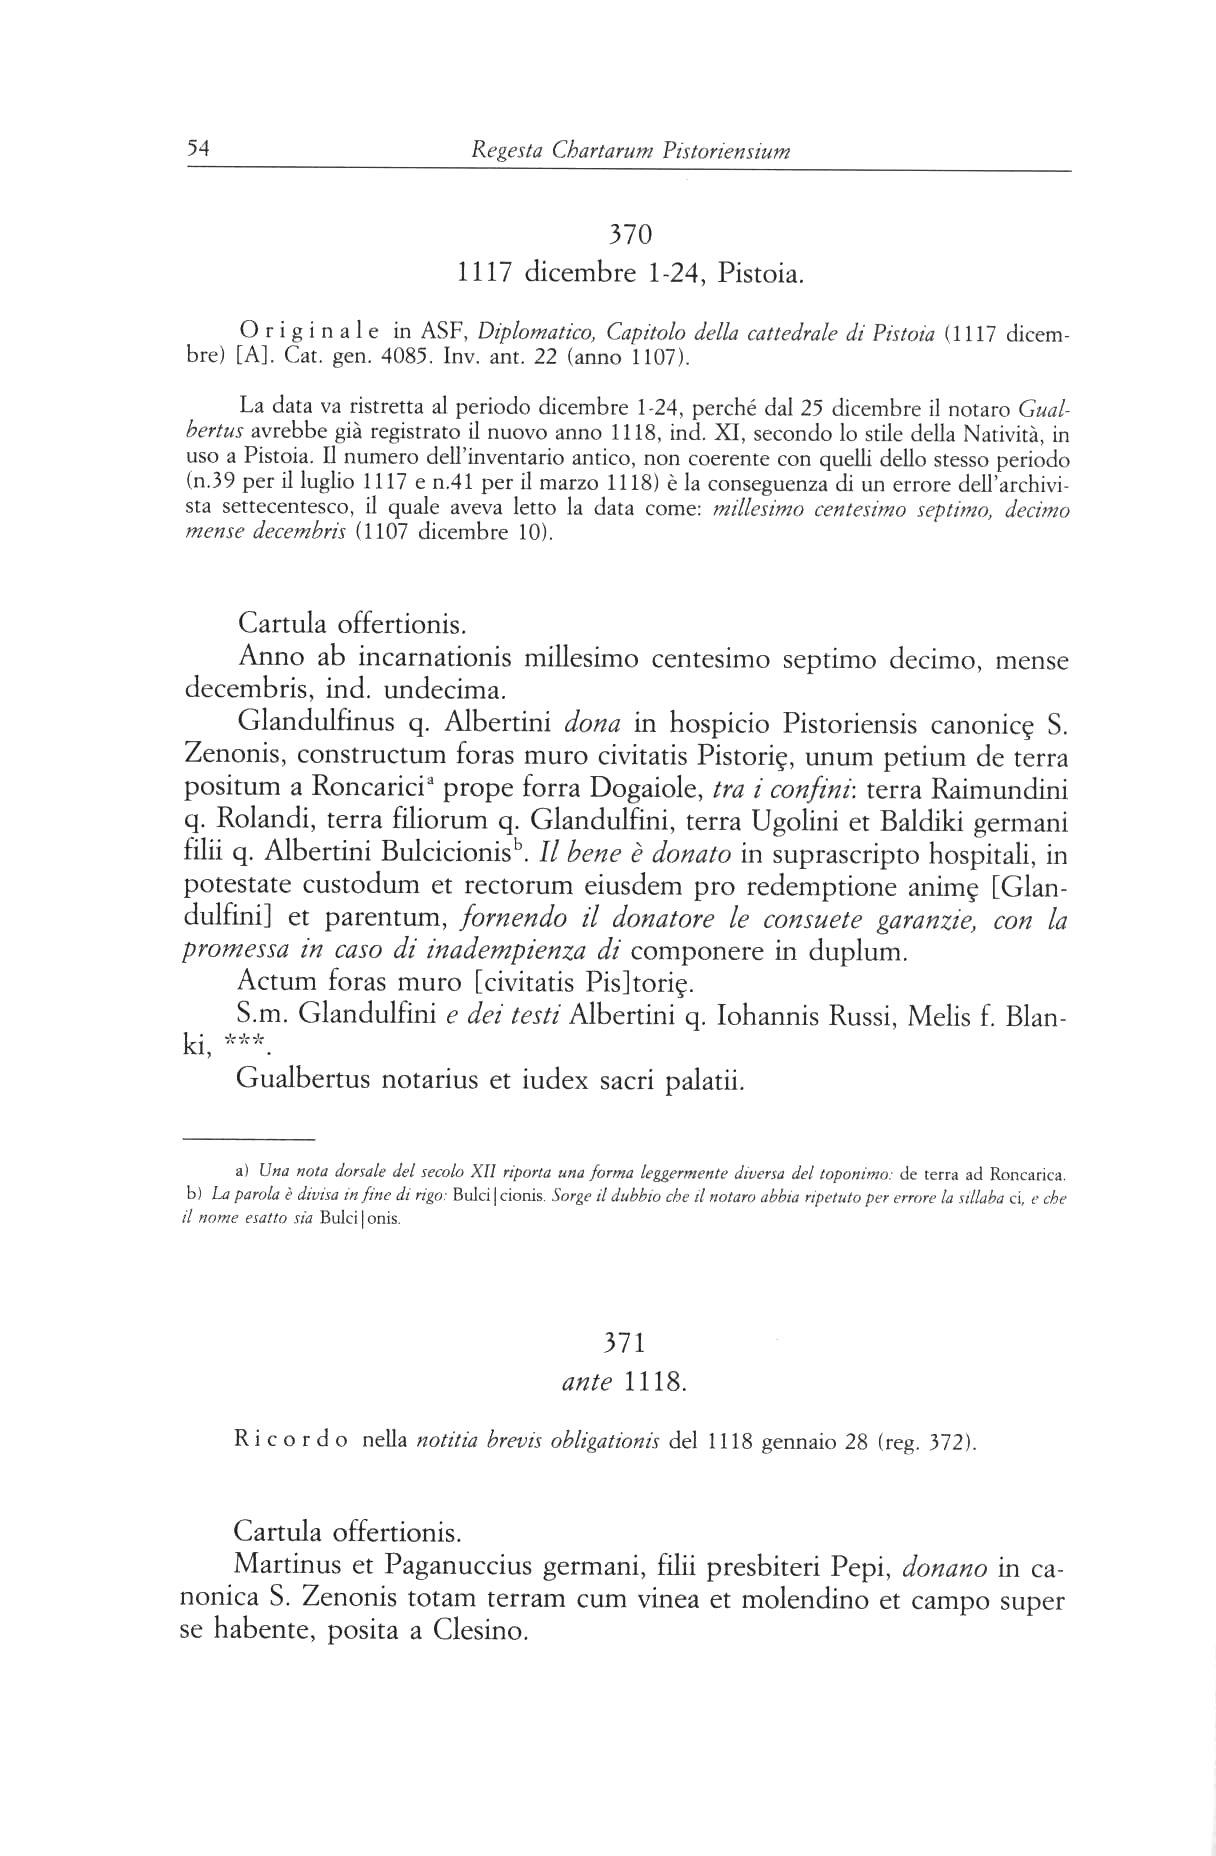 Canonica S. Zenone XII 0054.jpg